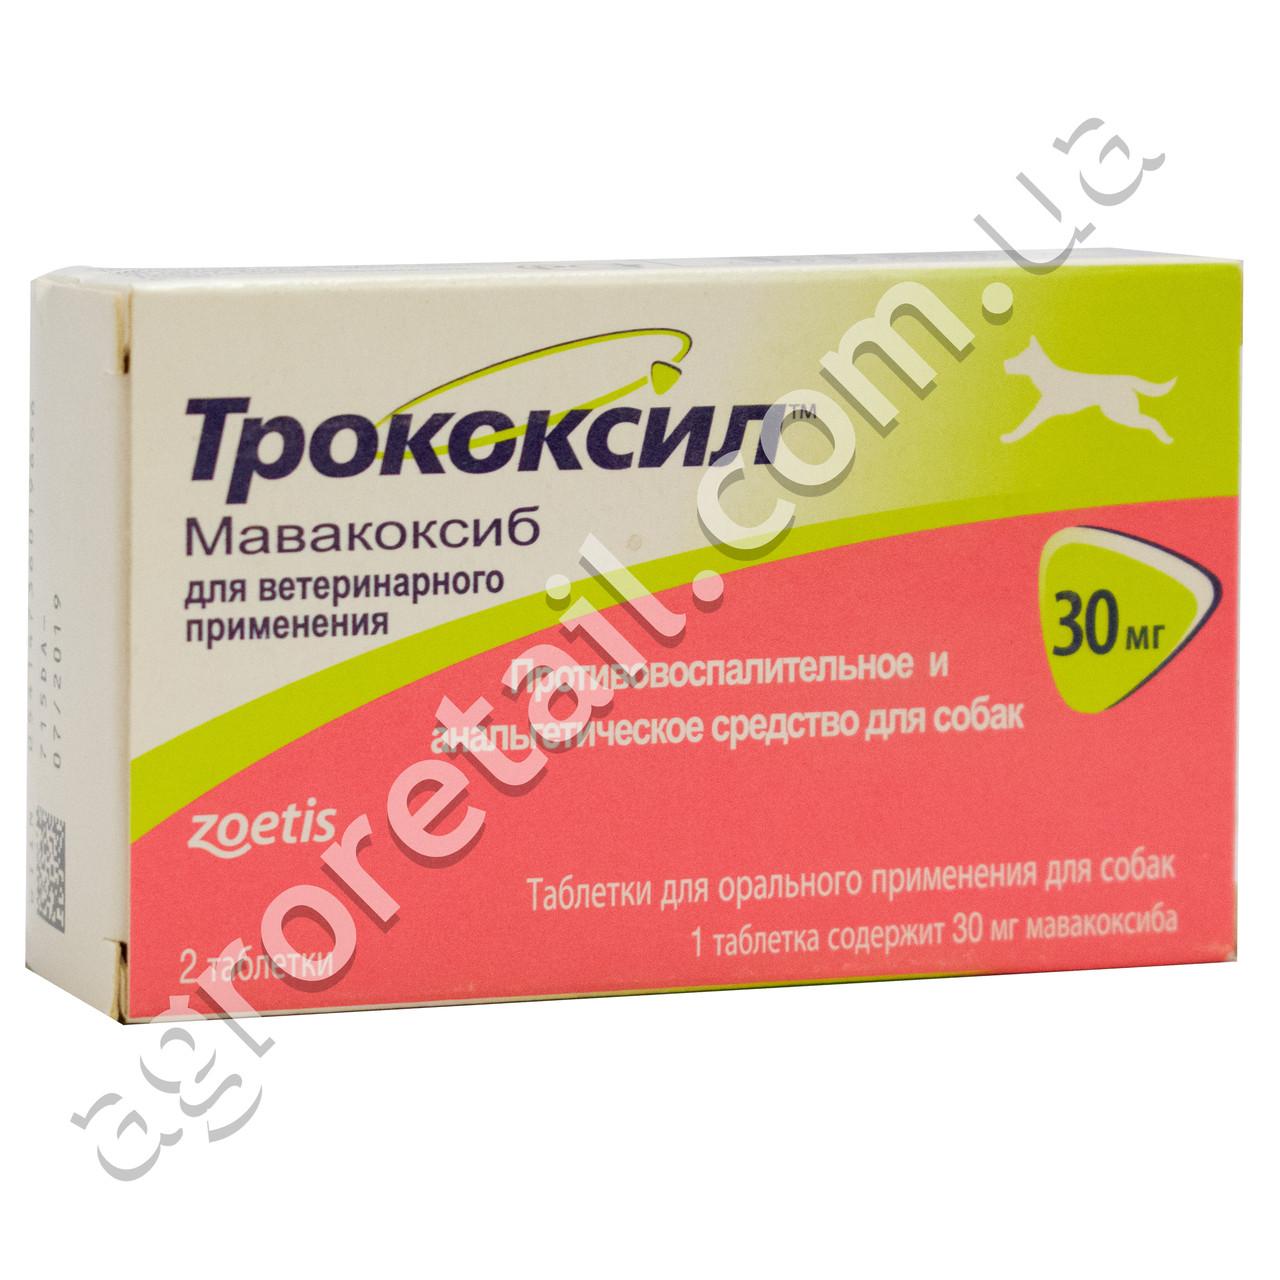 Трококсил 30 мг 2 таблетки